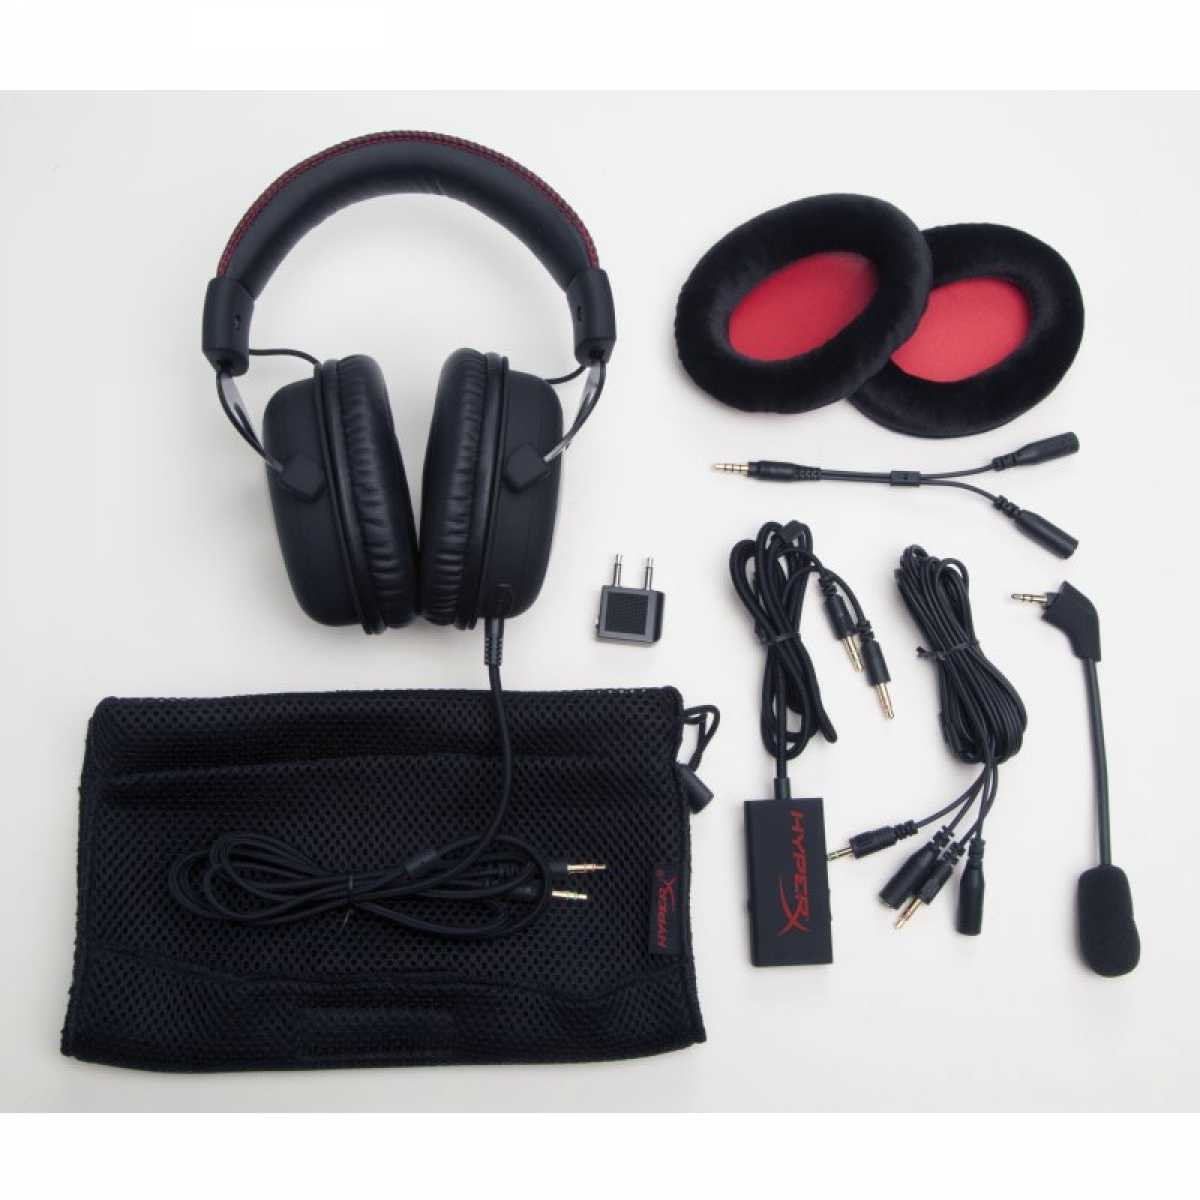 Headset HyperX Cloud Kingston Cloud Black KHX-H3CL/WR